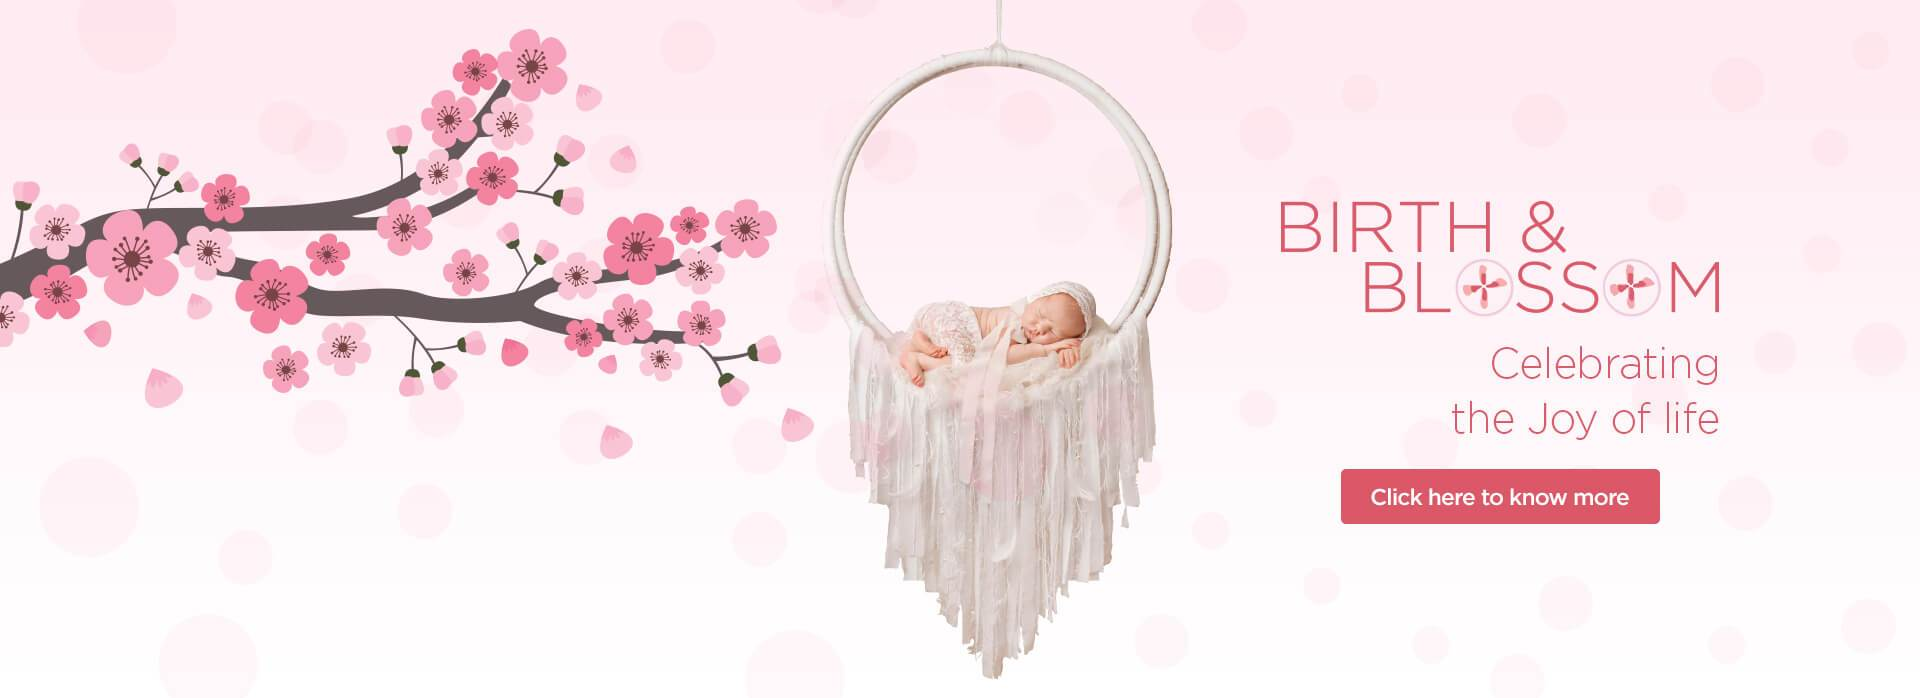 Sakra Birth and Blossom Centre Bangalore